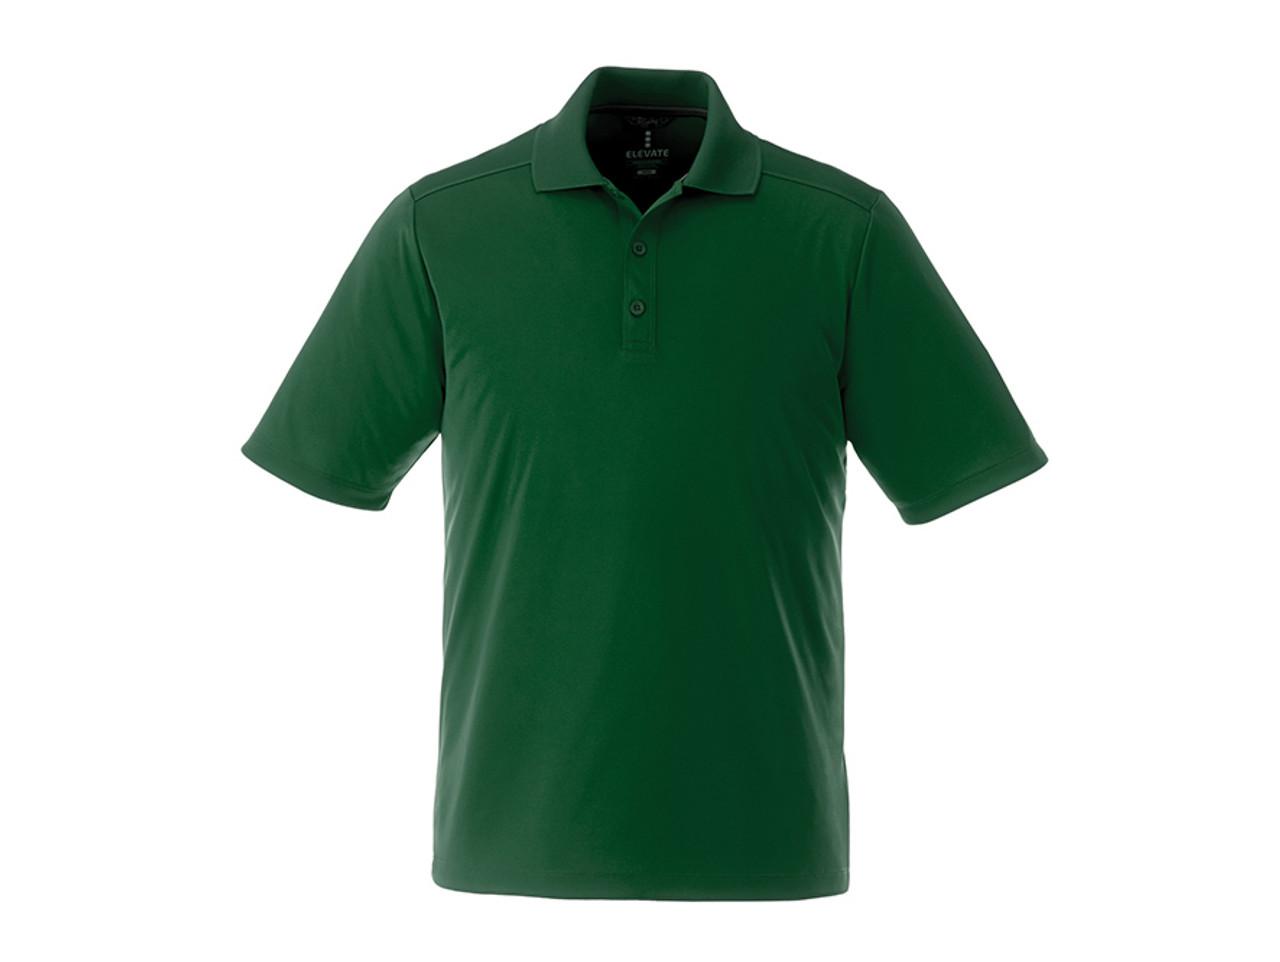 785b2779 ... Forest Green 16398 Dade Men's Short Sleeve Polo Shirt | Imprintables.  ...